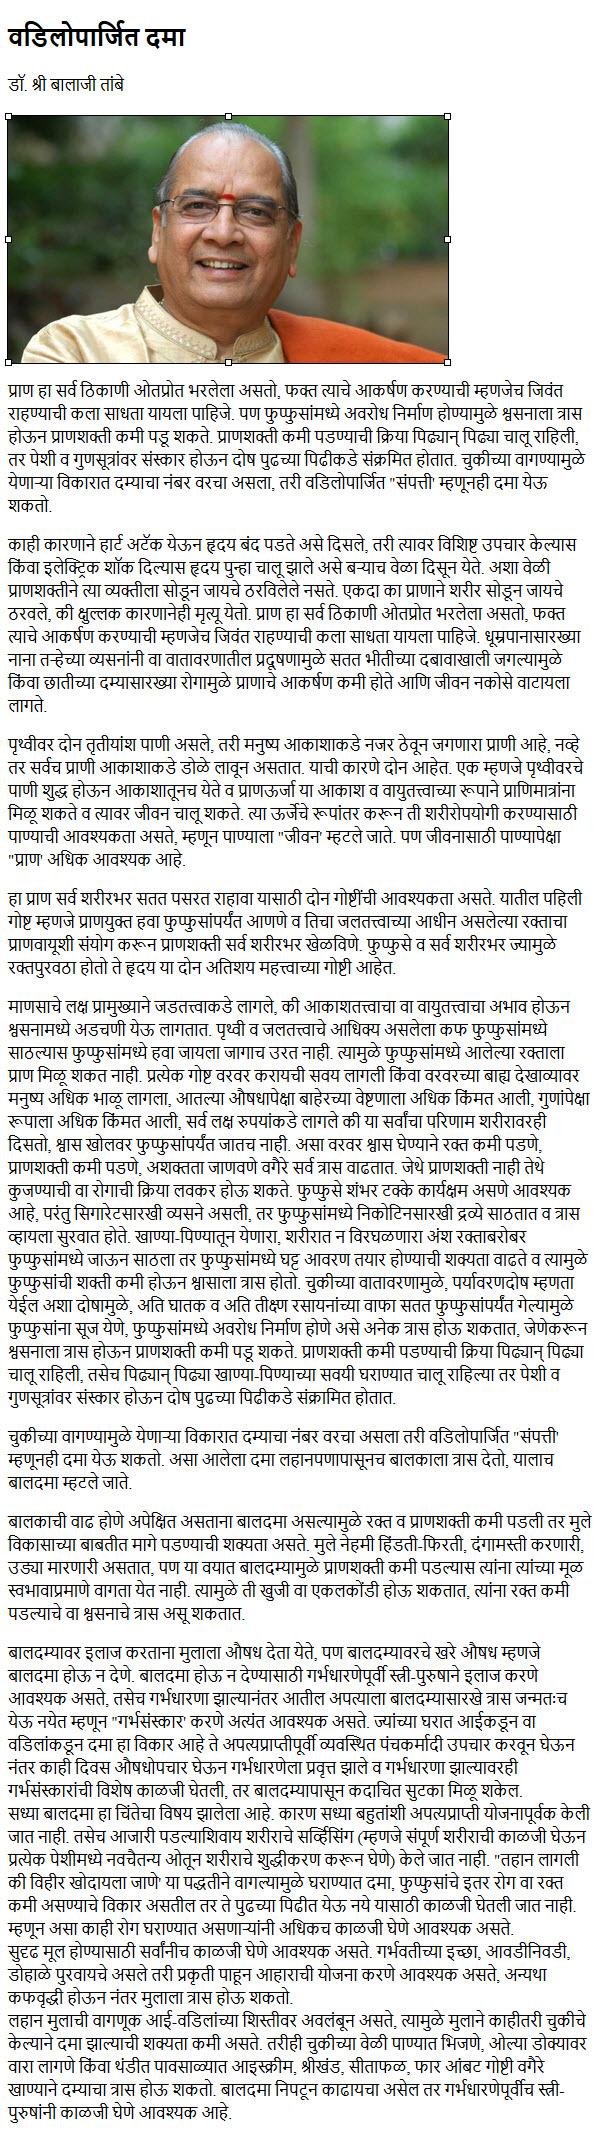 asthma treatment in ayurveda in marathi